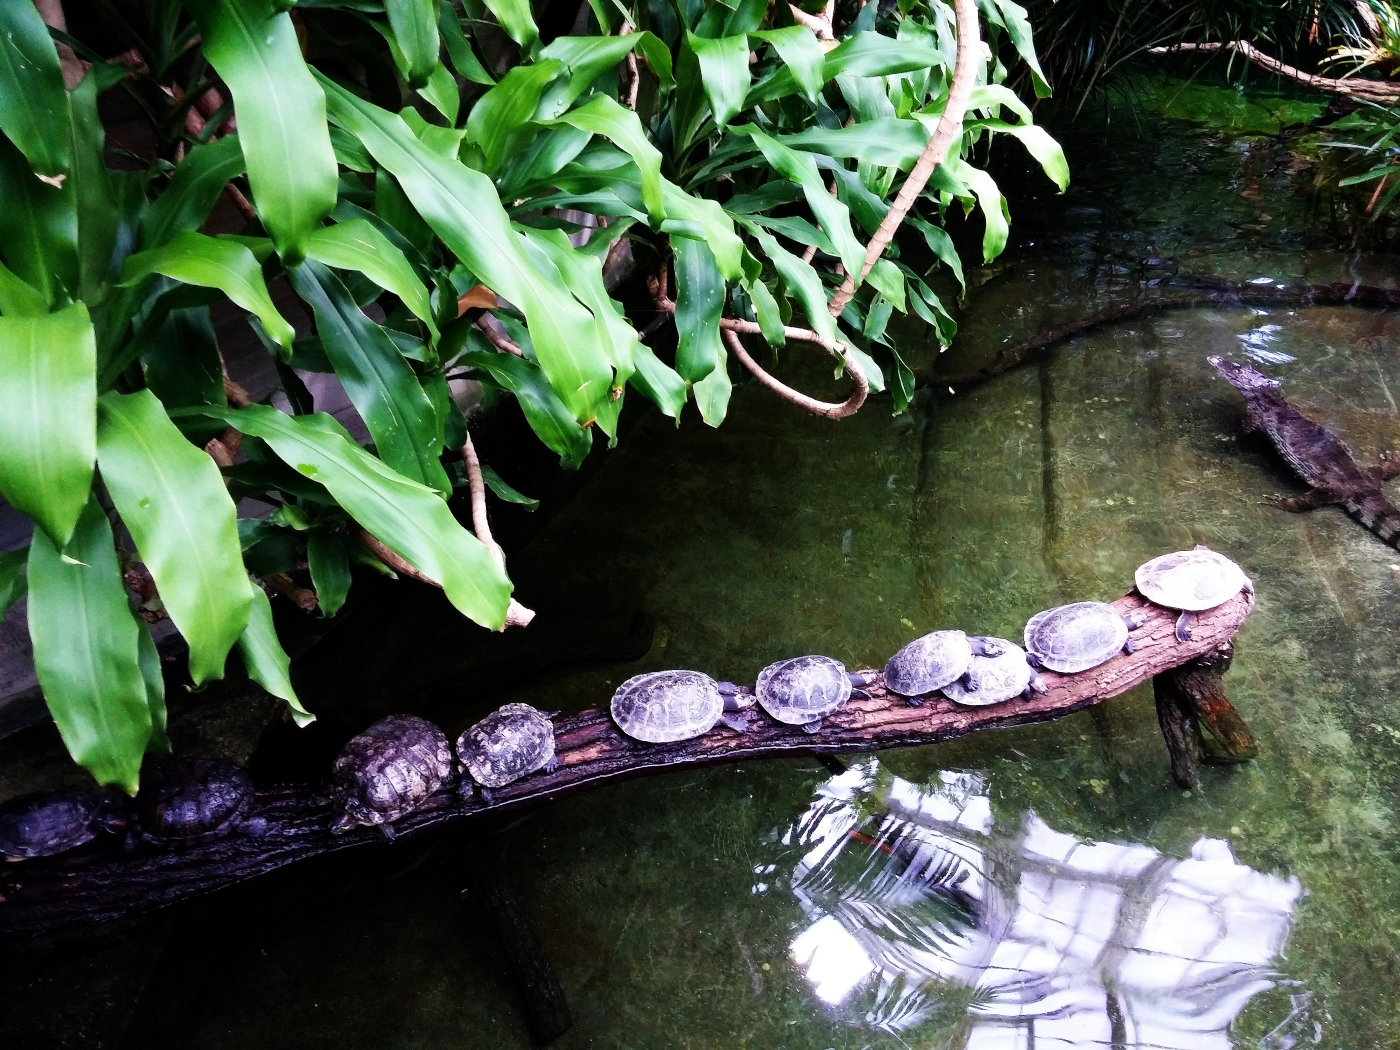 Черепахи рядком на закусь к крокодилу